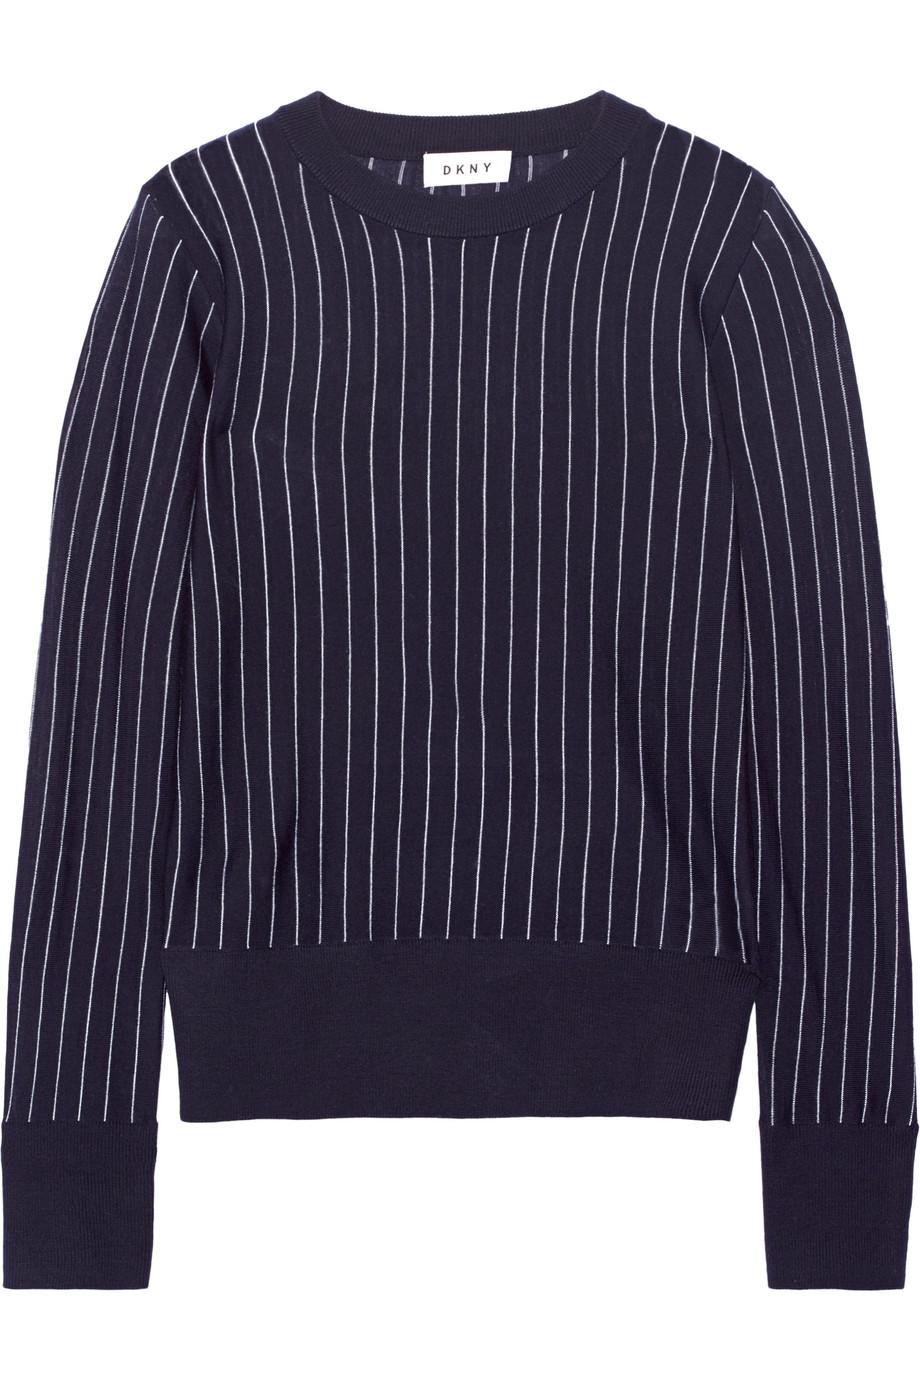 DKNY Striped Merino Wool Sweater, Navy, Women's, Size: XXS